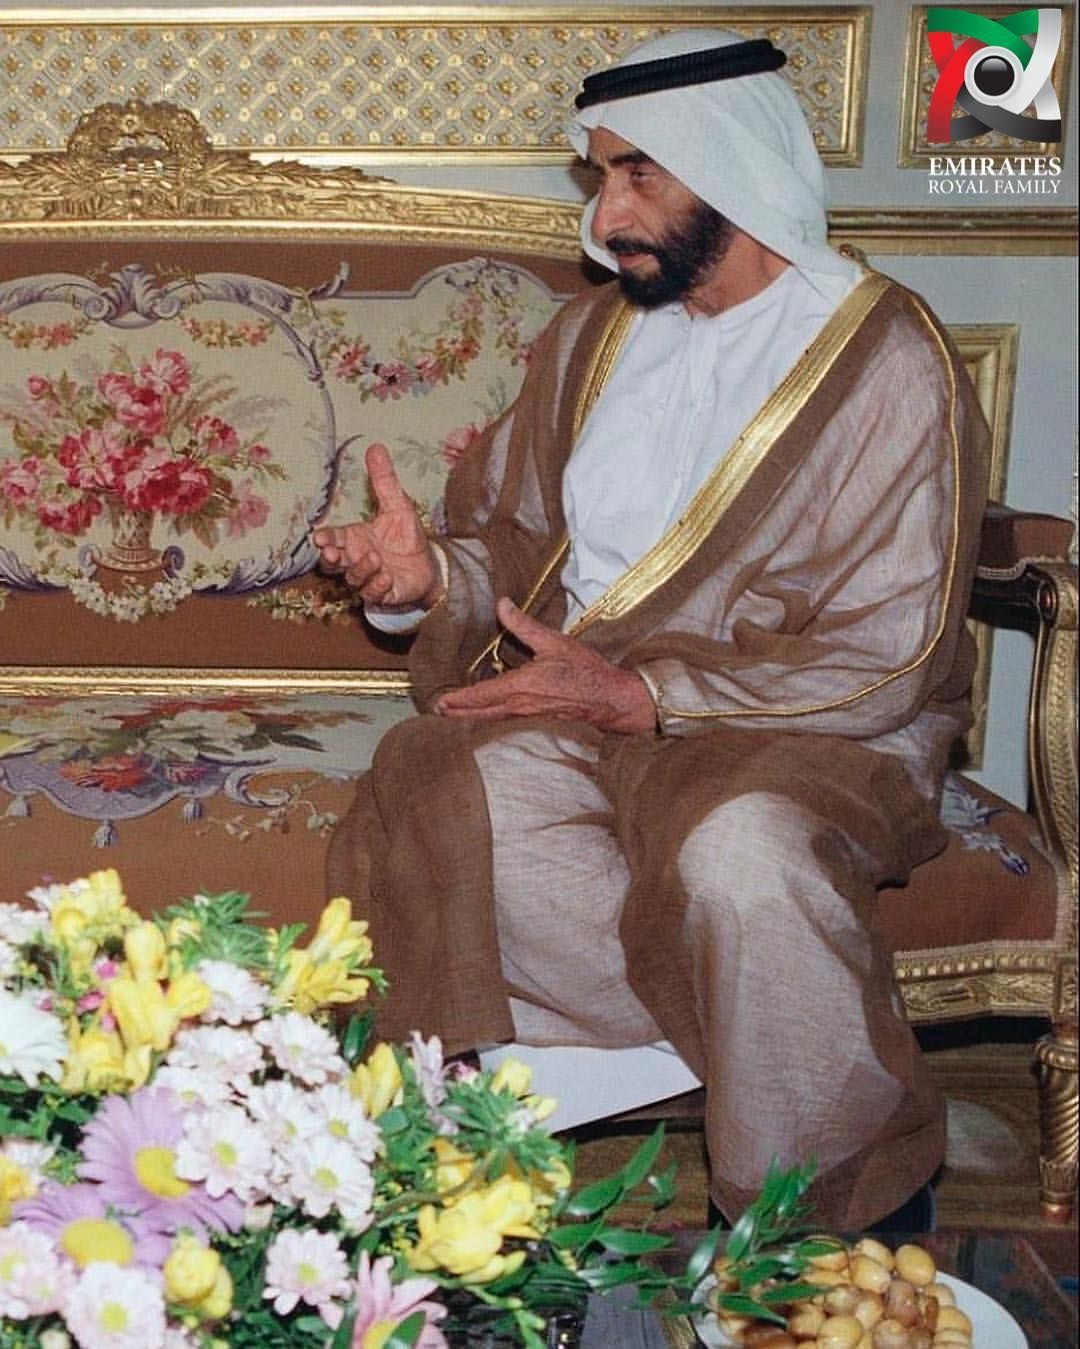 Sheik, United Arab Emirates, Royal Families, Uae, Presidents, Crown,  Identity, Prince, Corona